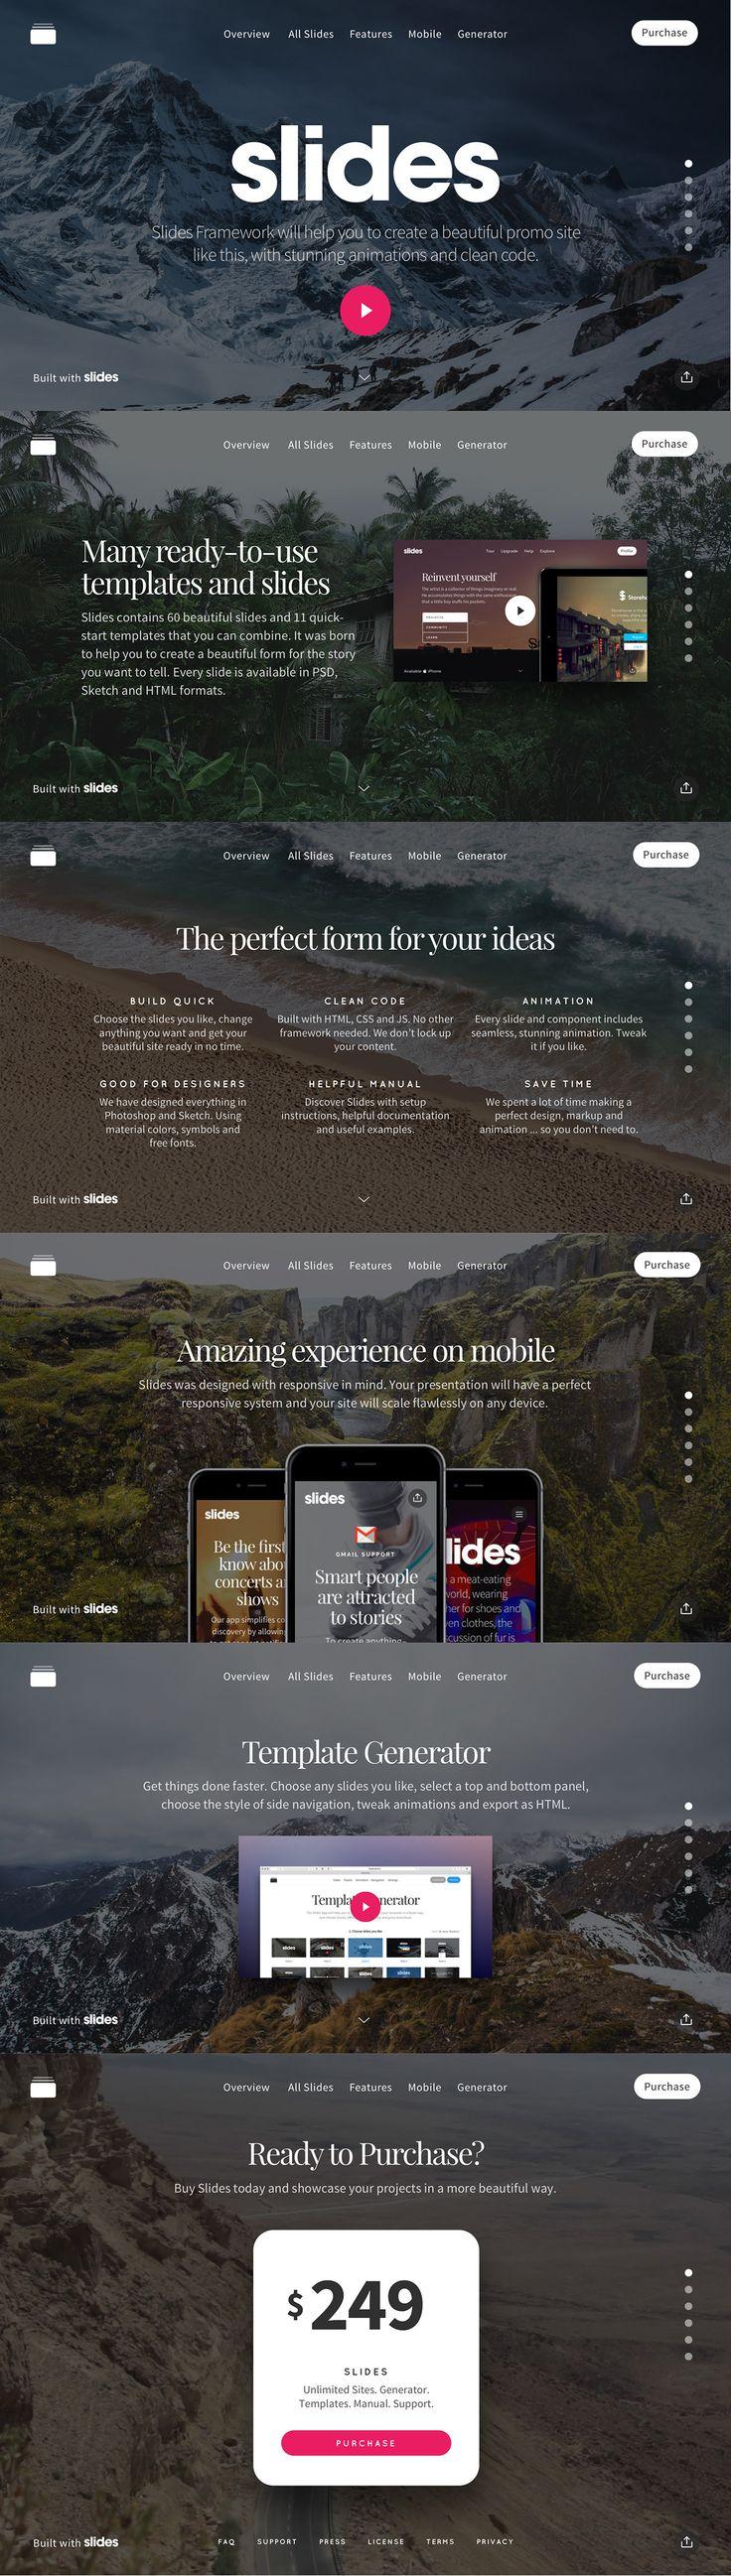 419 best User Interface & Web Design Inspiration images on Pinterest